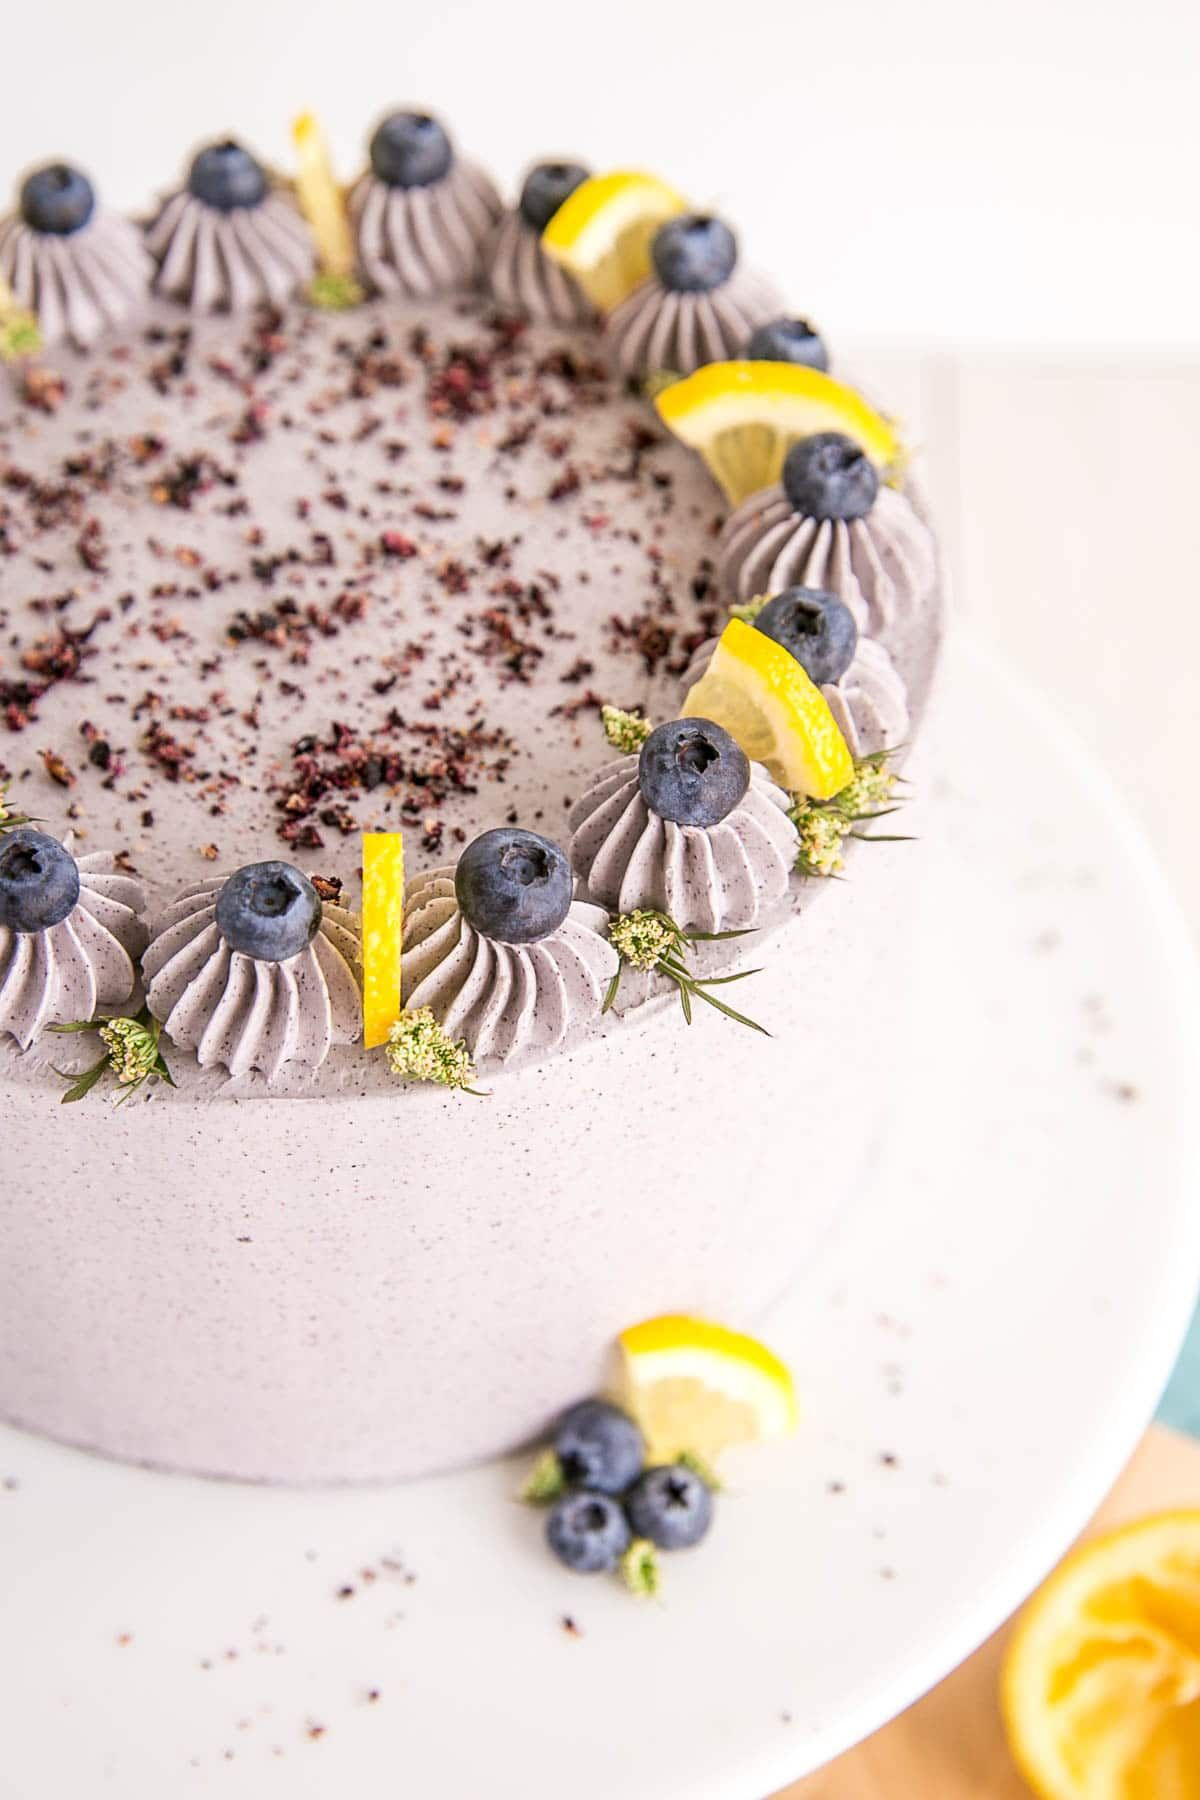 Lemon Blueberry Cake A Moist And Delicious Lemon Cake With Fresh Blueberries And A Blueberry Buttercr Blueberry Lemon Cake Blueberry Cake Delicious Lemon Cake